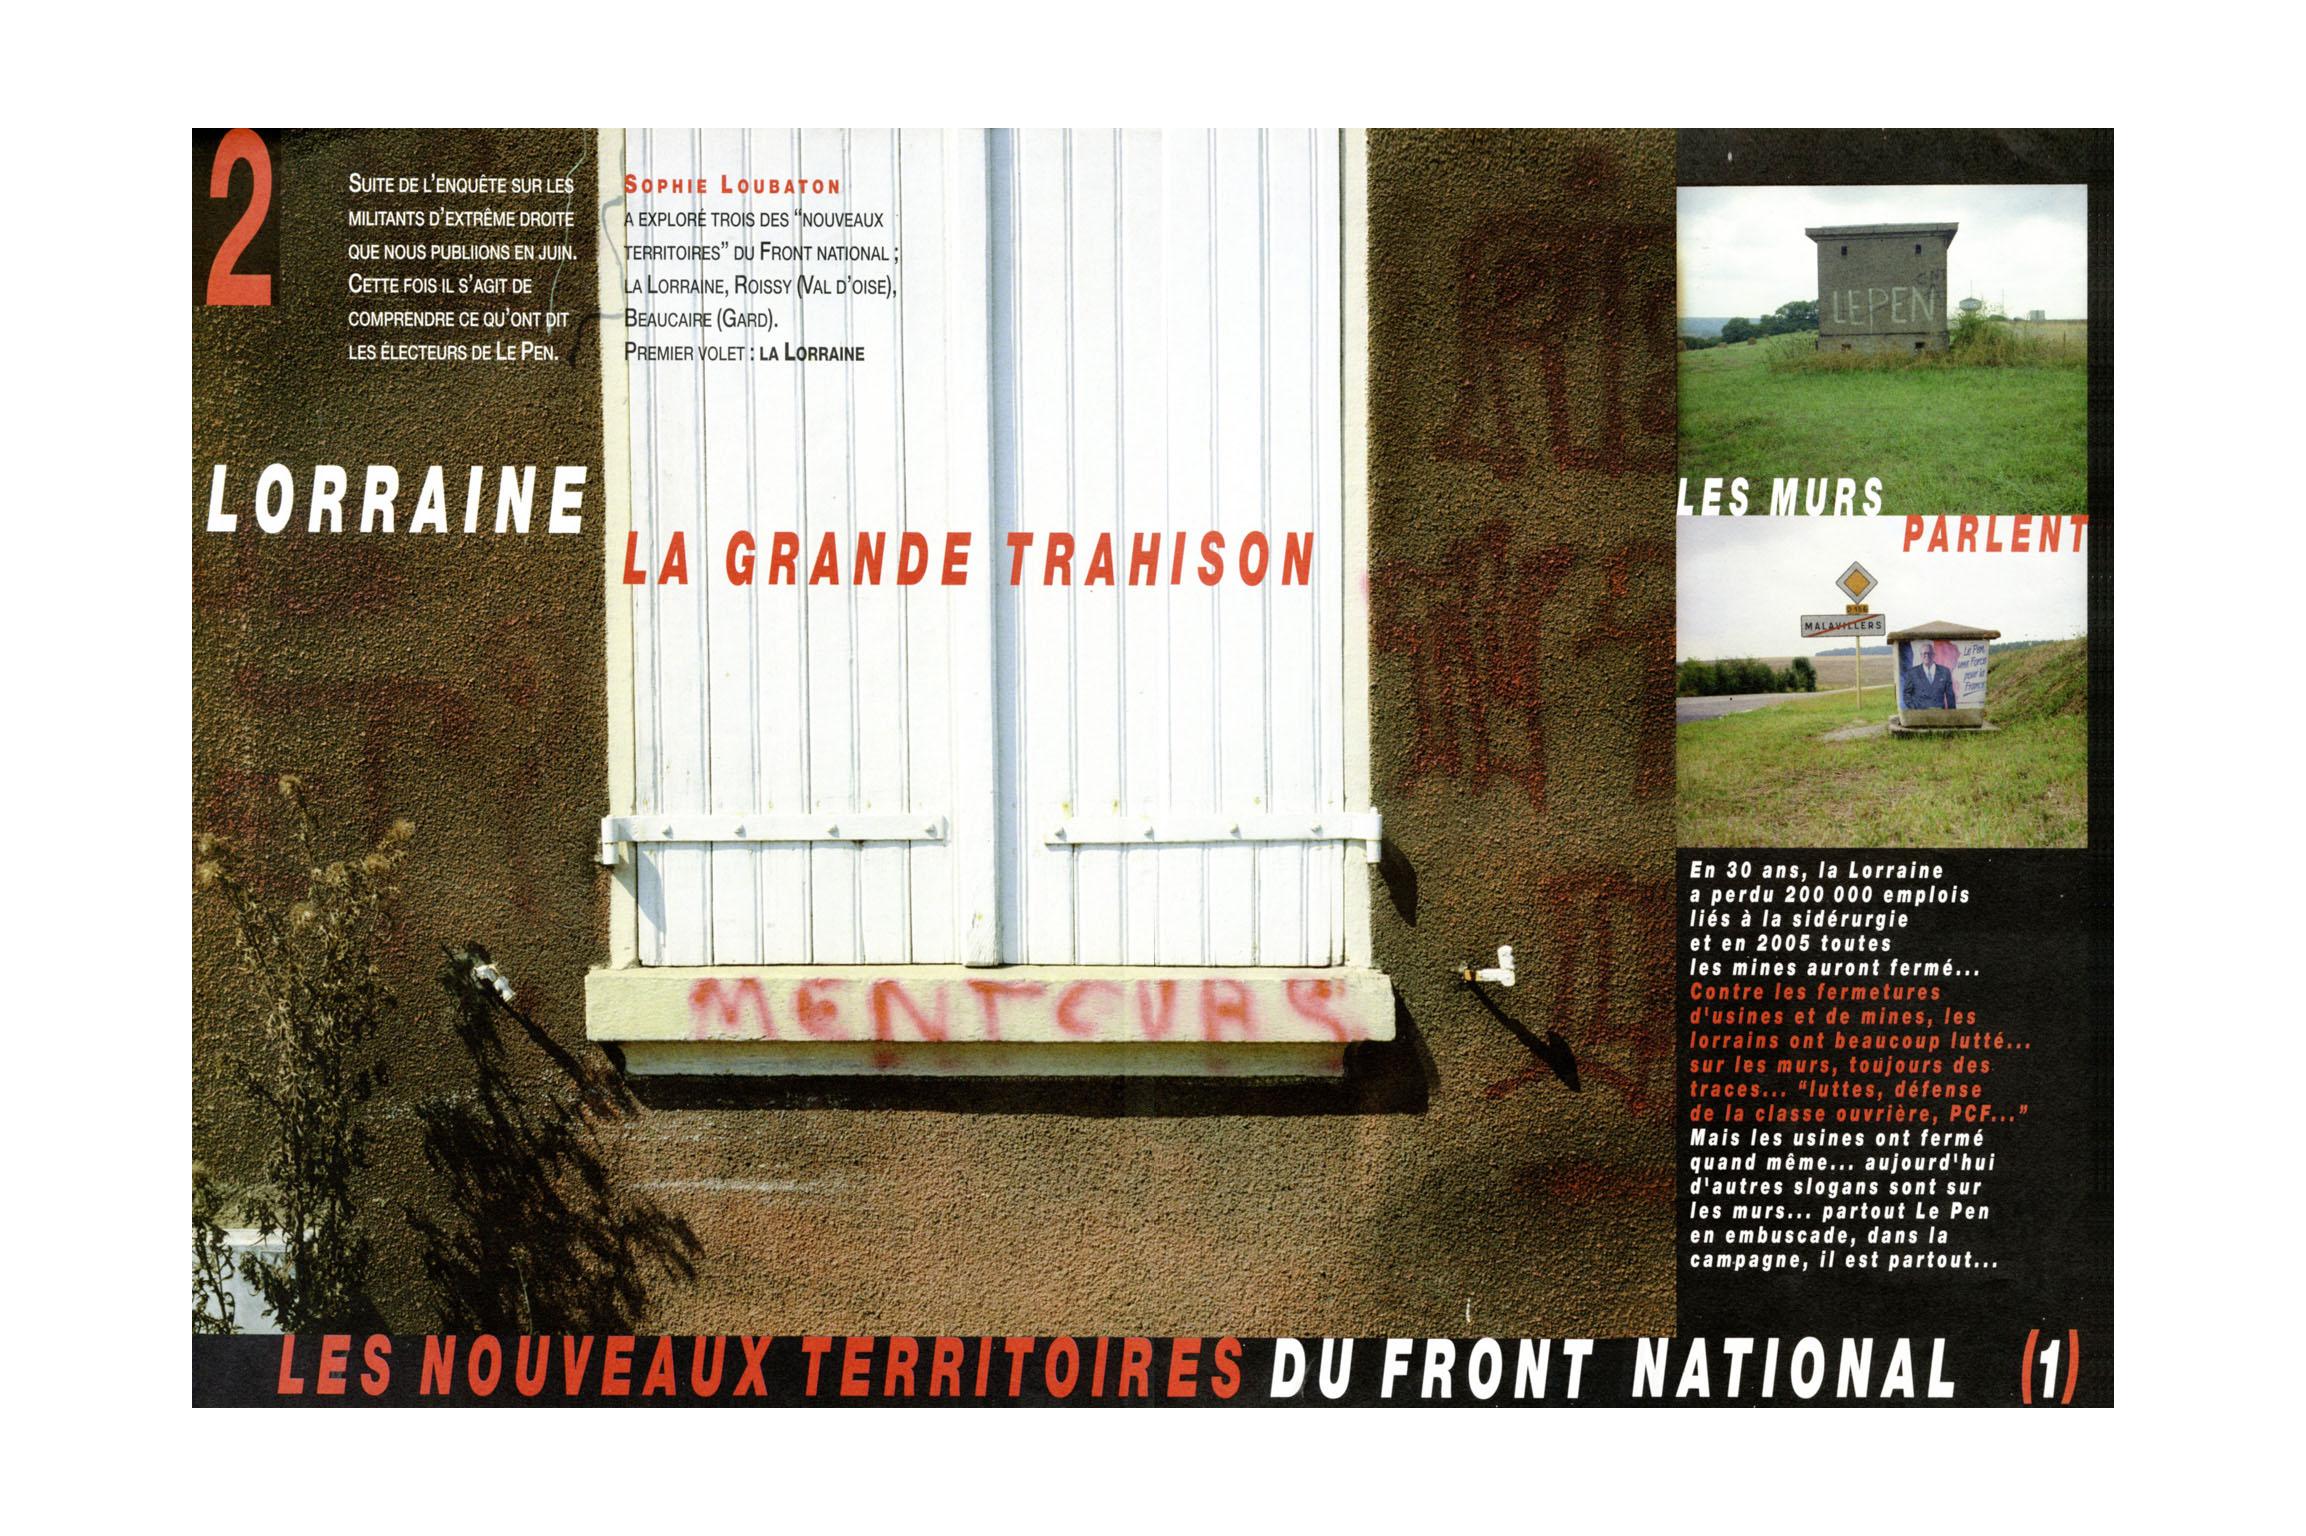 # LORRAINE, LA GRANDE TRAHISON _ REVUE REGARDS / SEPT 2002